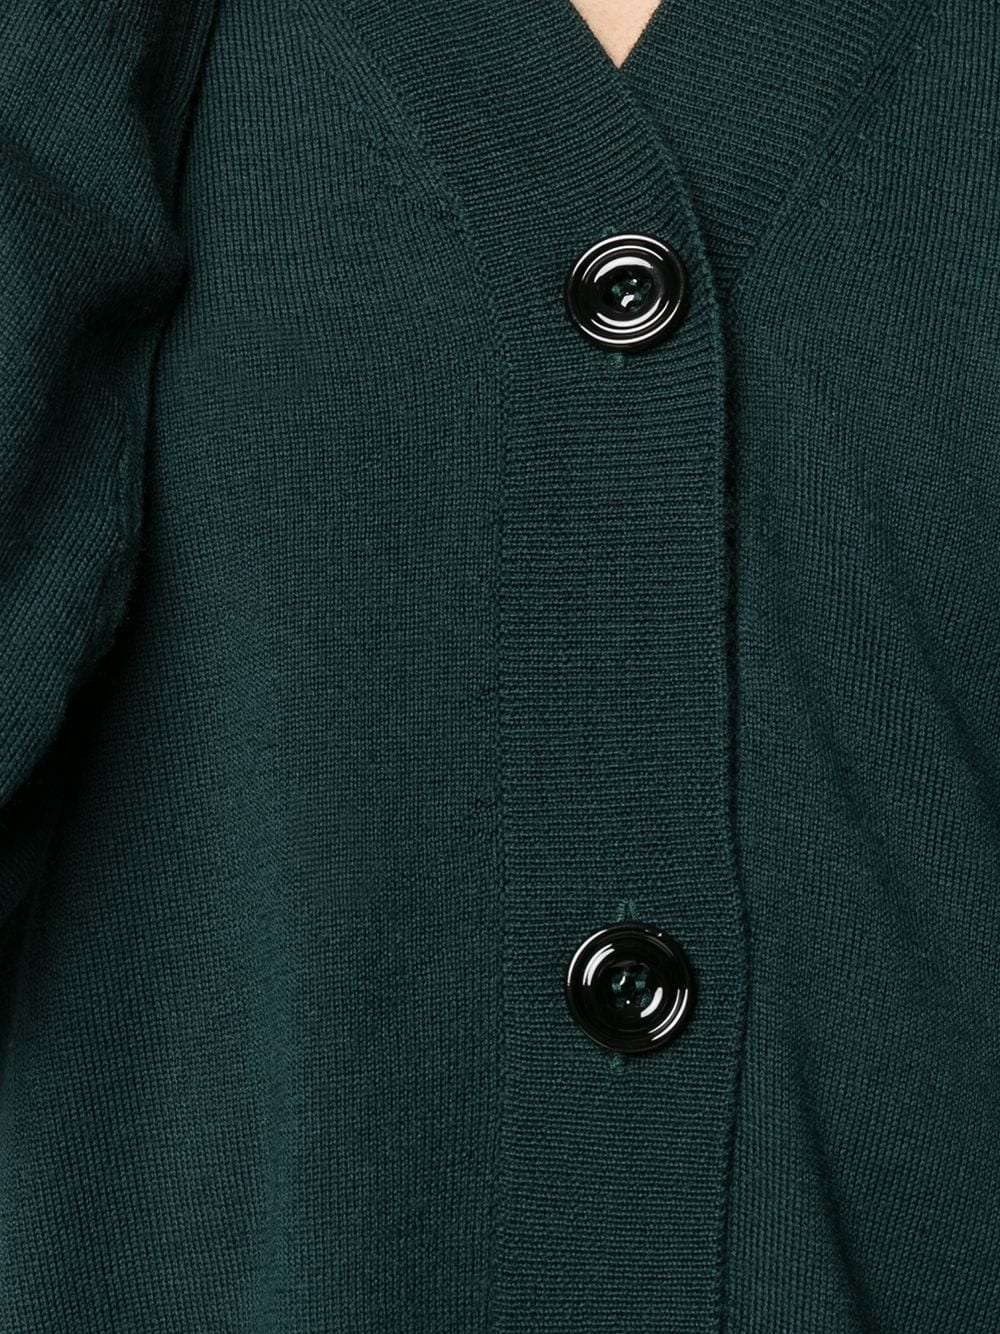 Dark green virgin wool cardigan featuring ribbed edge ALTEA |  | 206152843